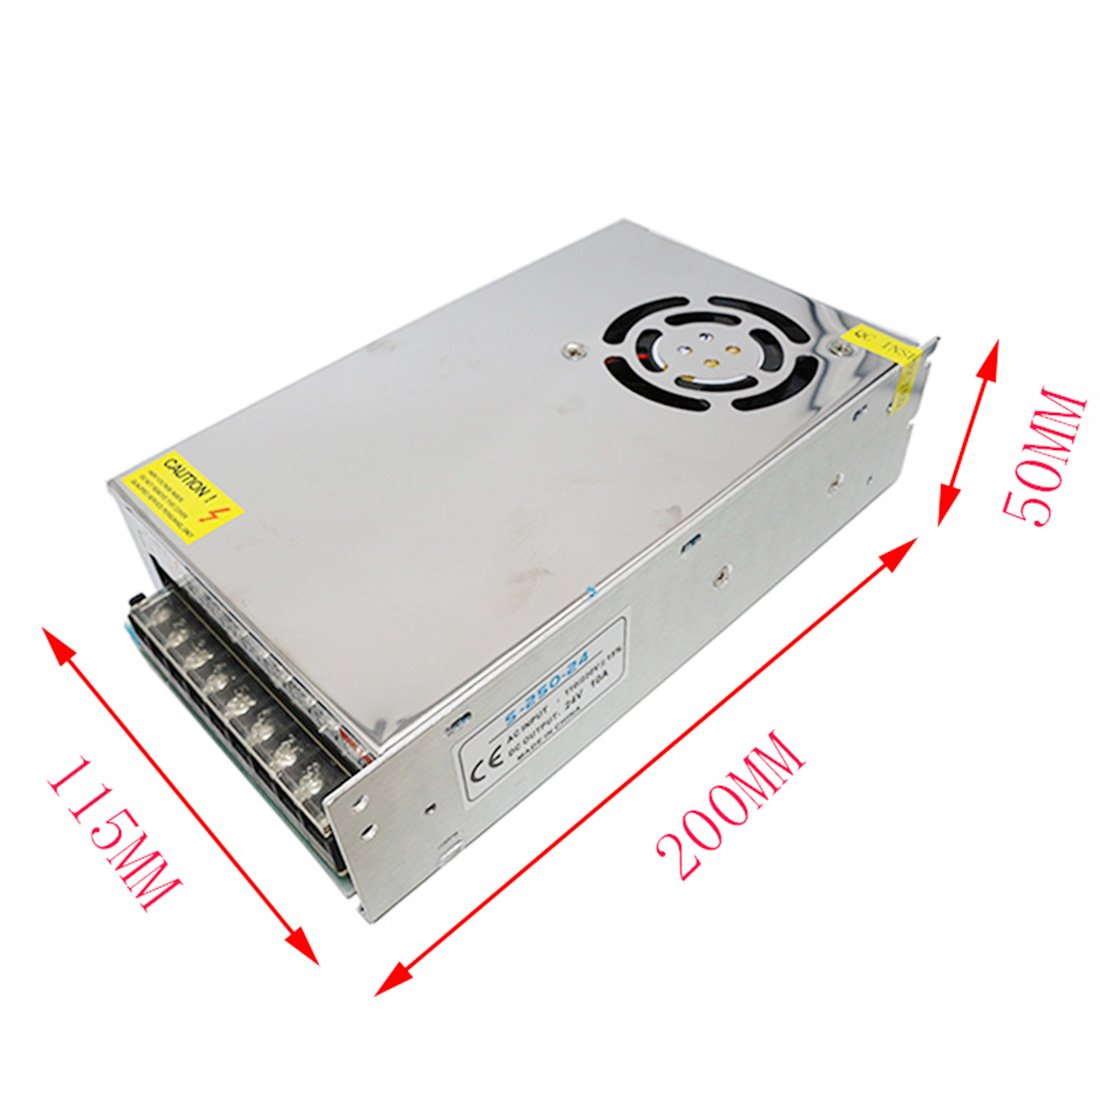 Amazon com: NC XQIN 24V Power Supply, 24V 10A 240W AC to DC